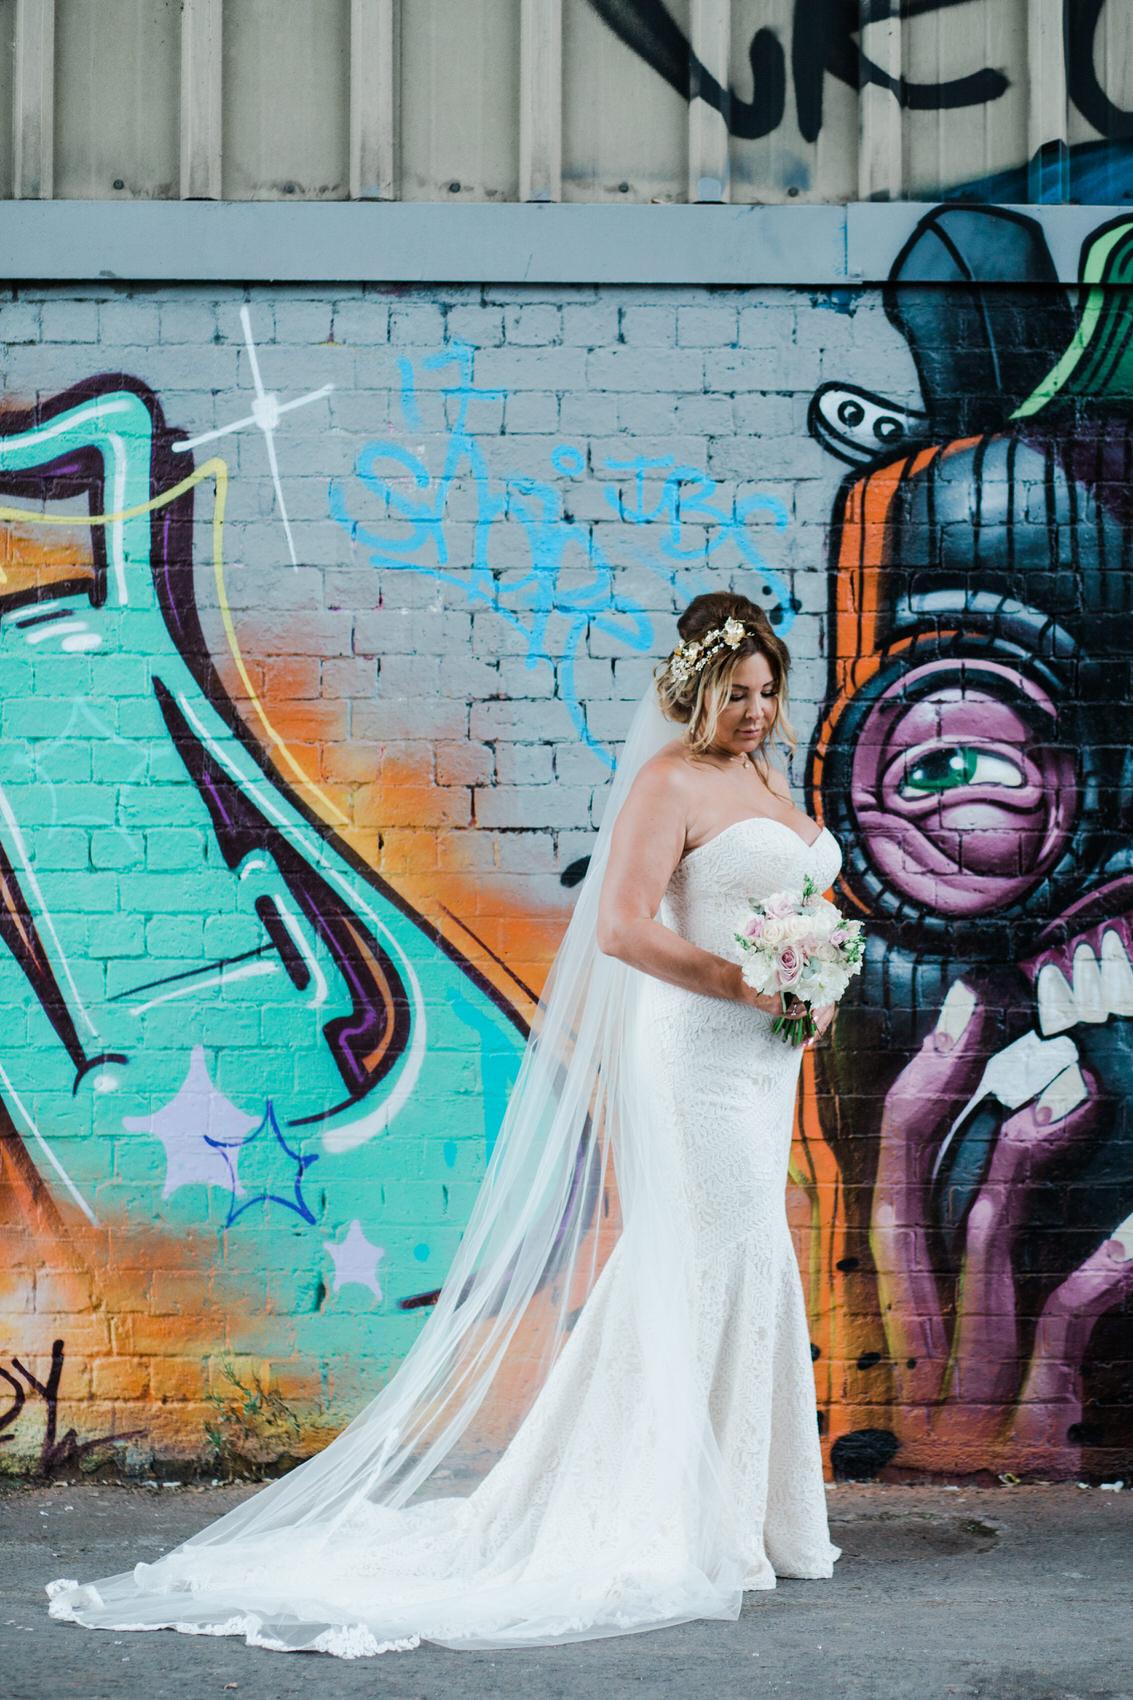 Glamorous Alternative Wedding at Fazeley Studios063